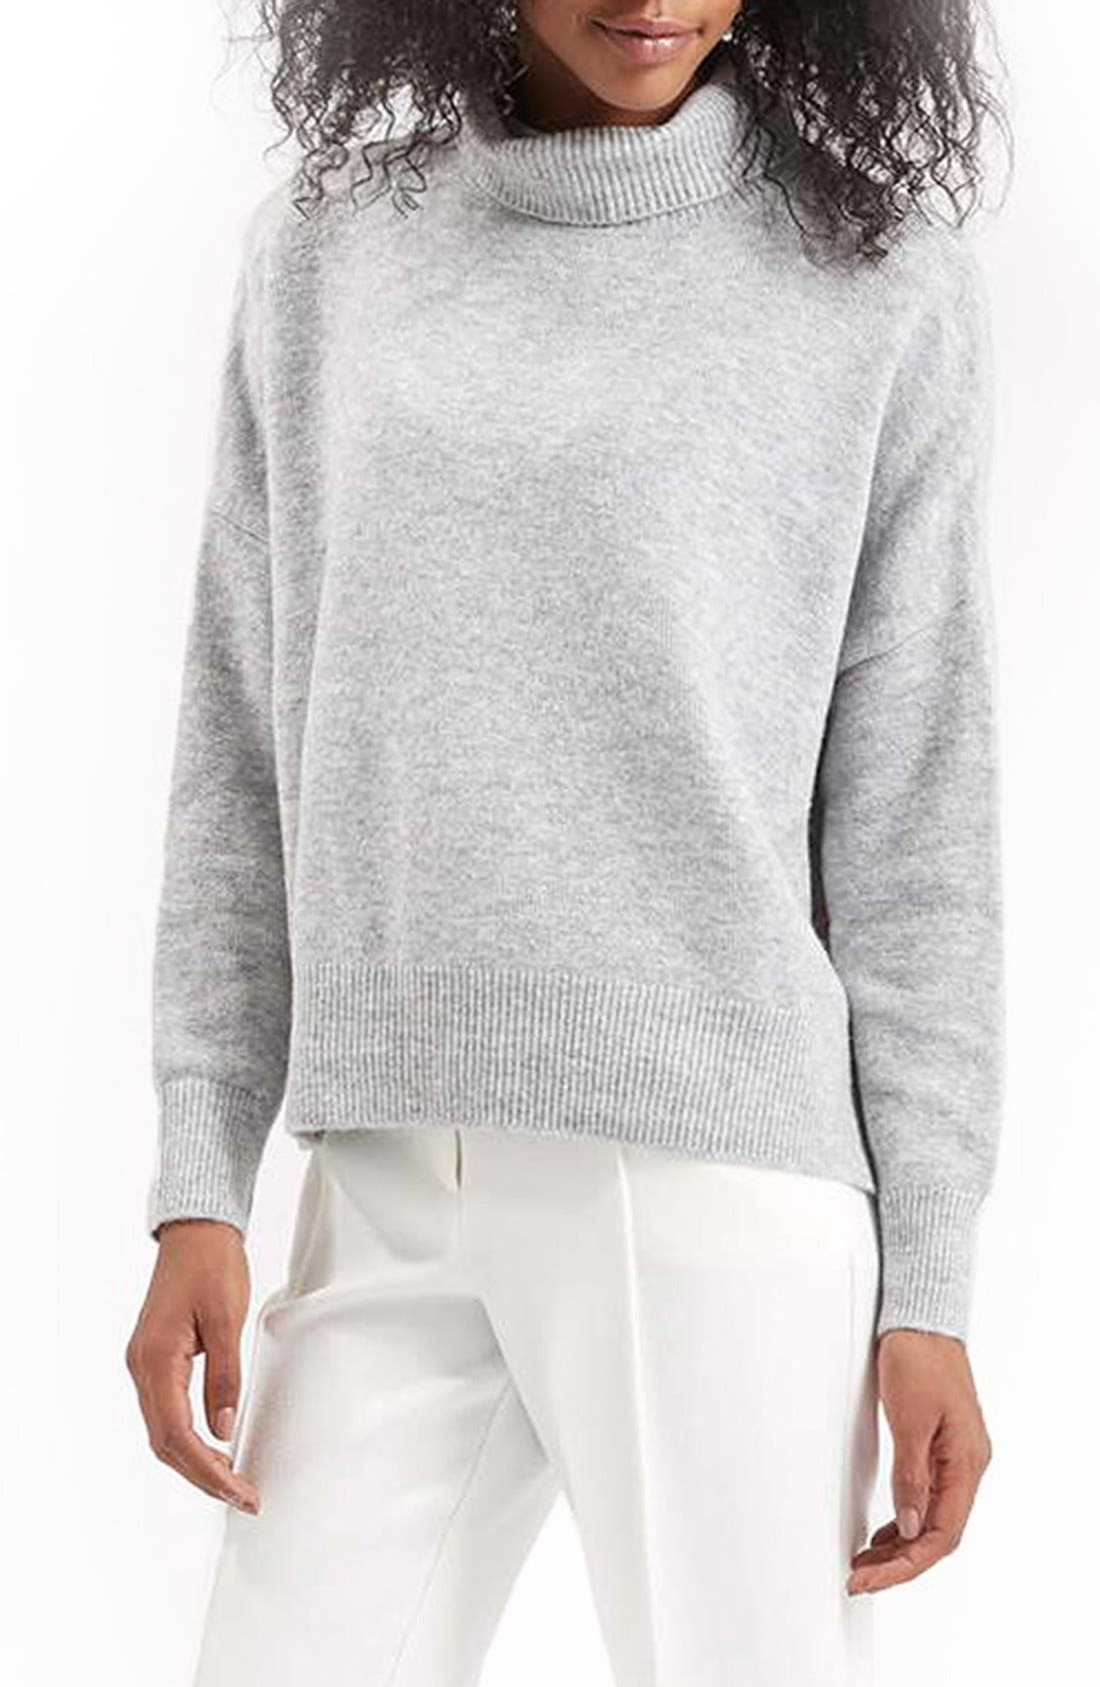 Main Image - TopshopBack Zip Turtleneck Sweater